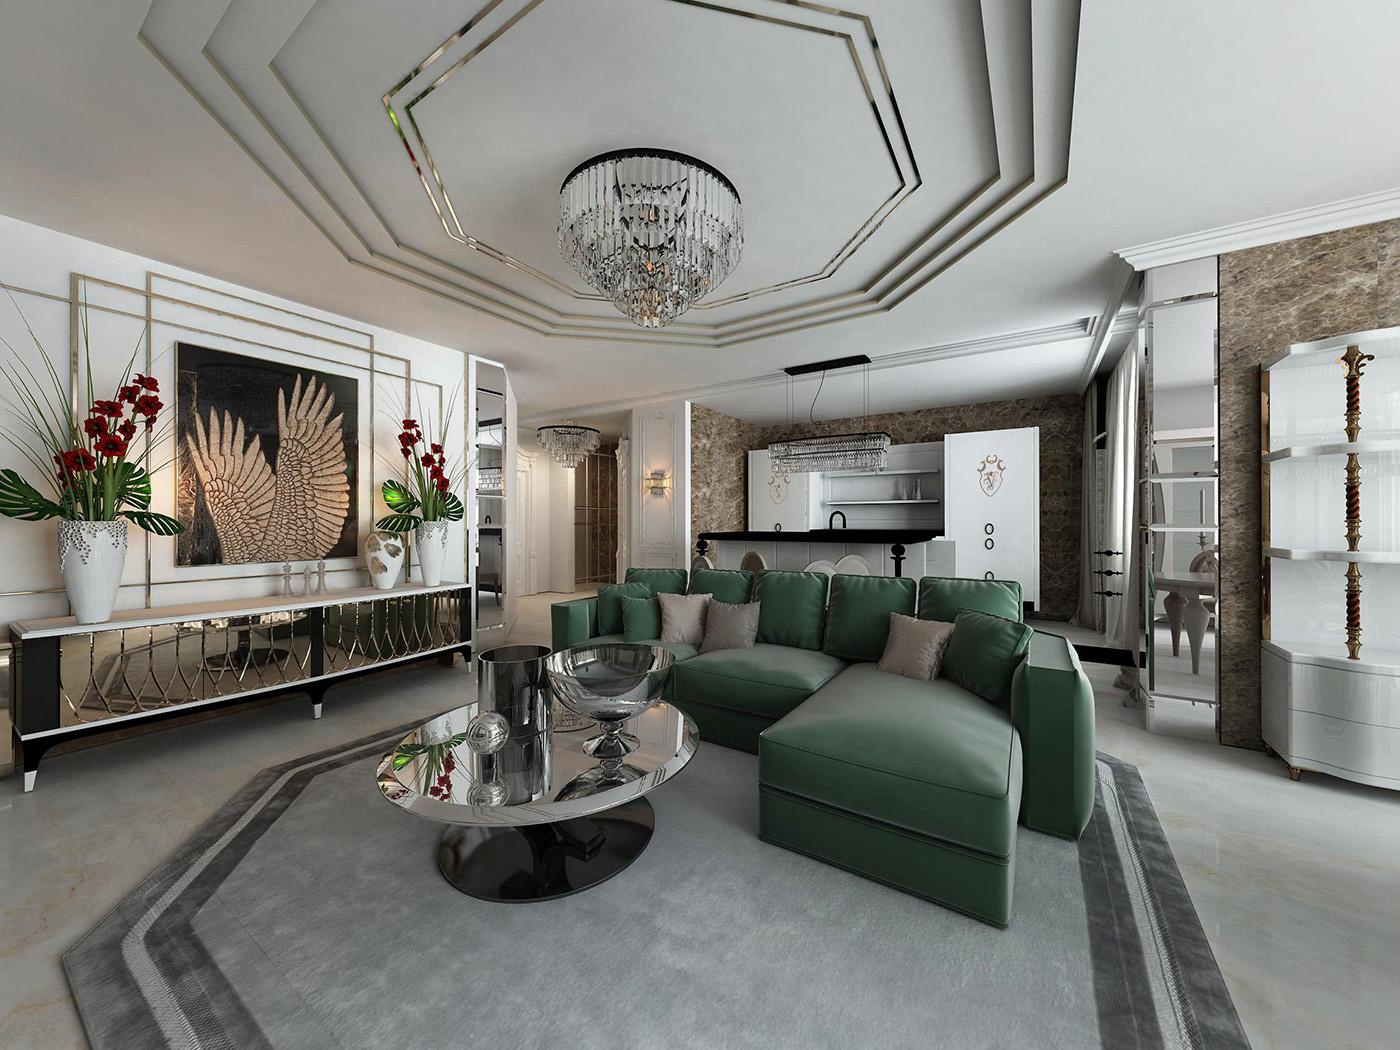 дизайн гостиной visionnaire